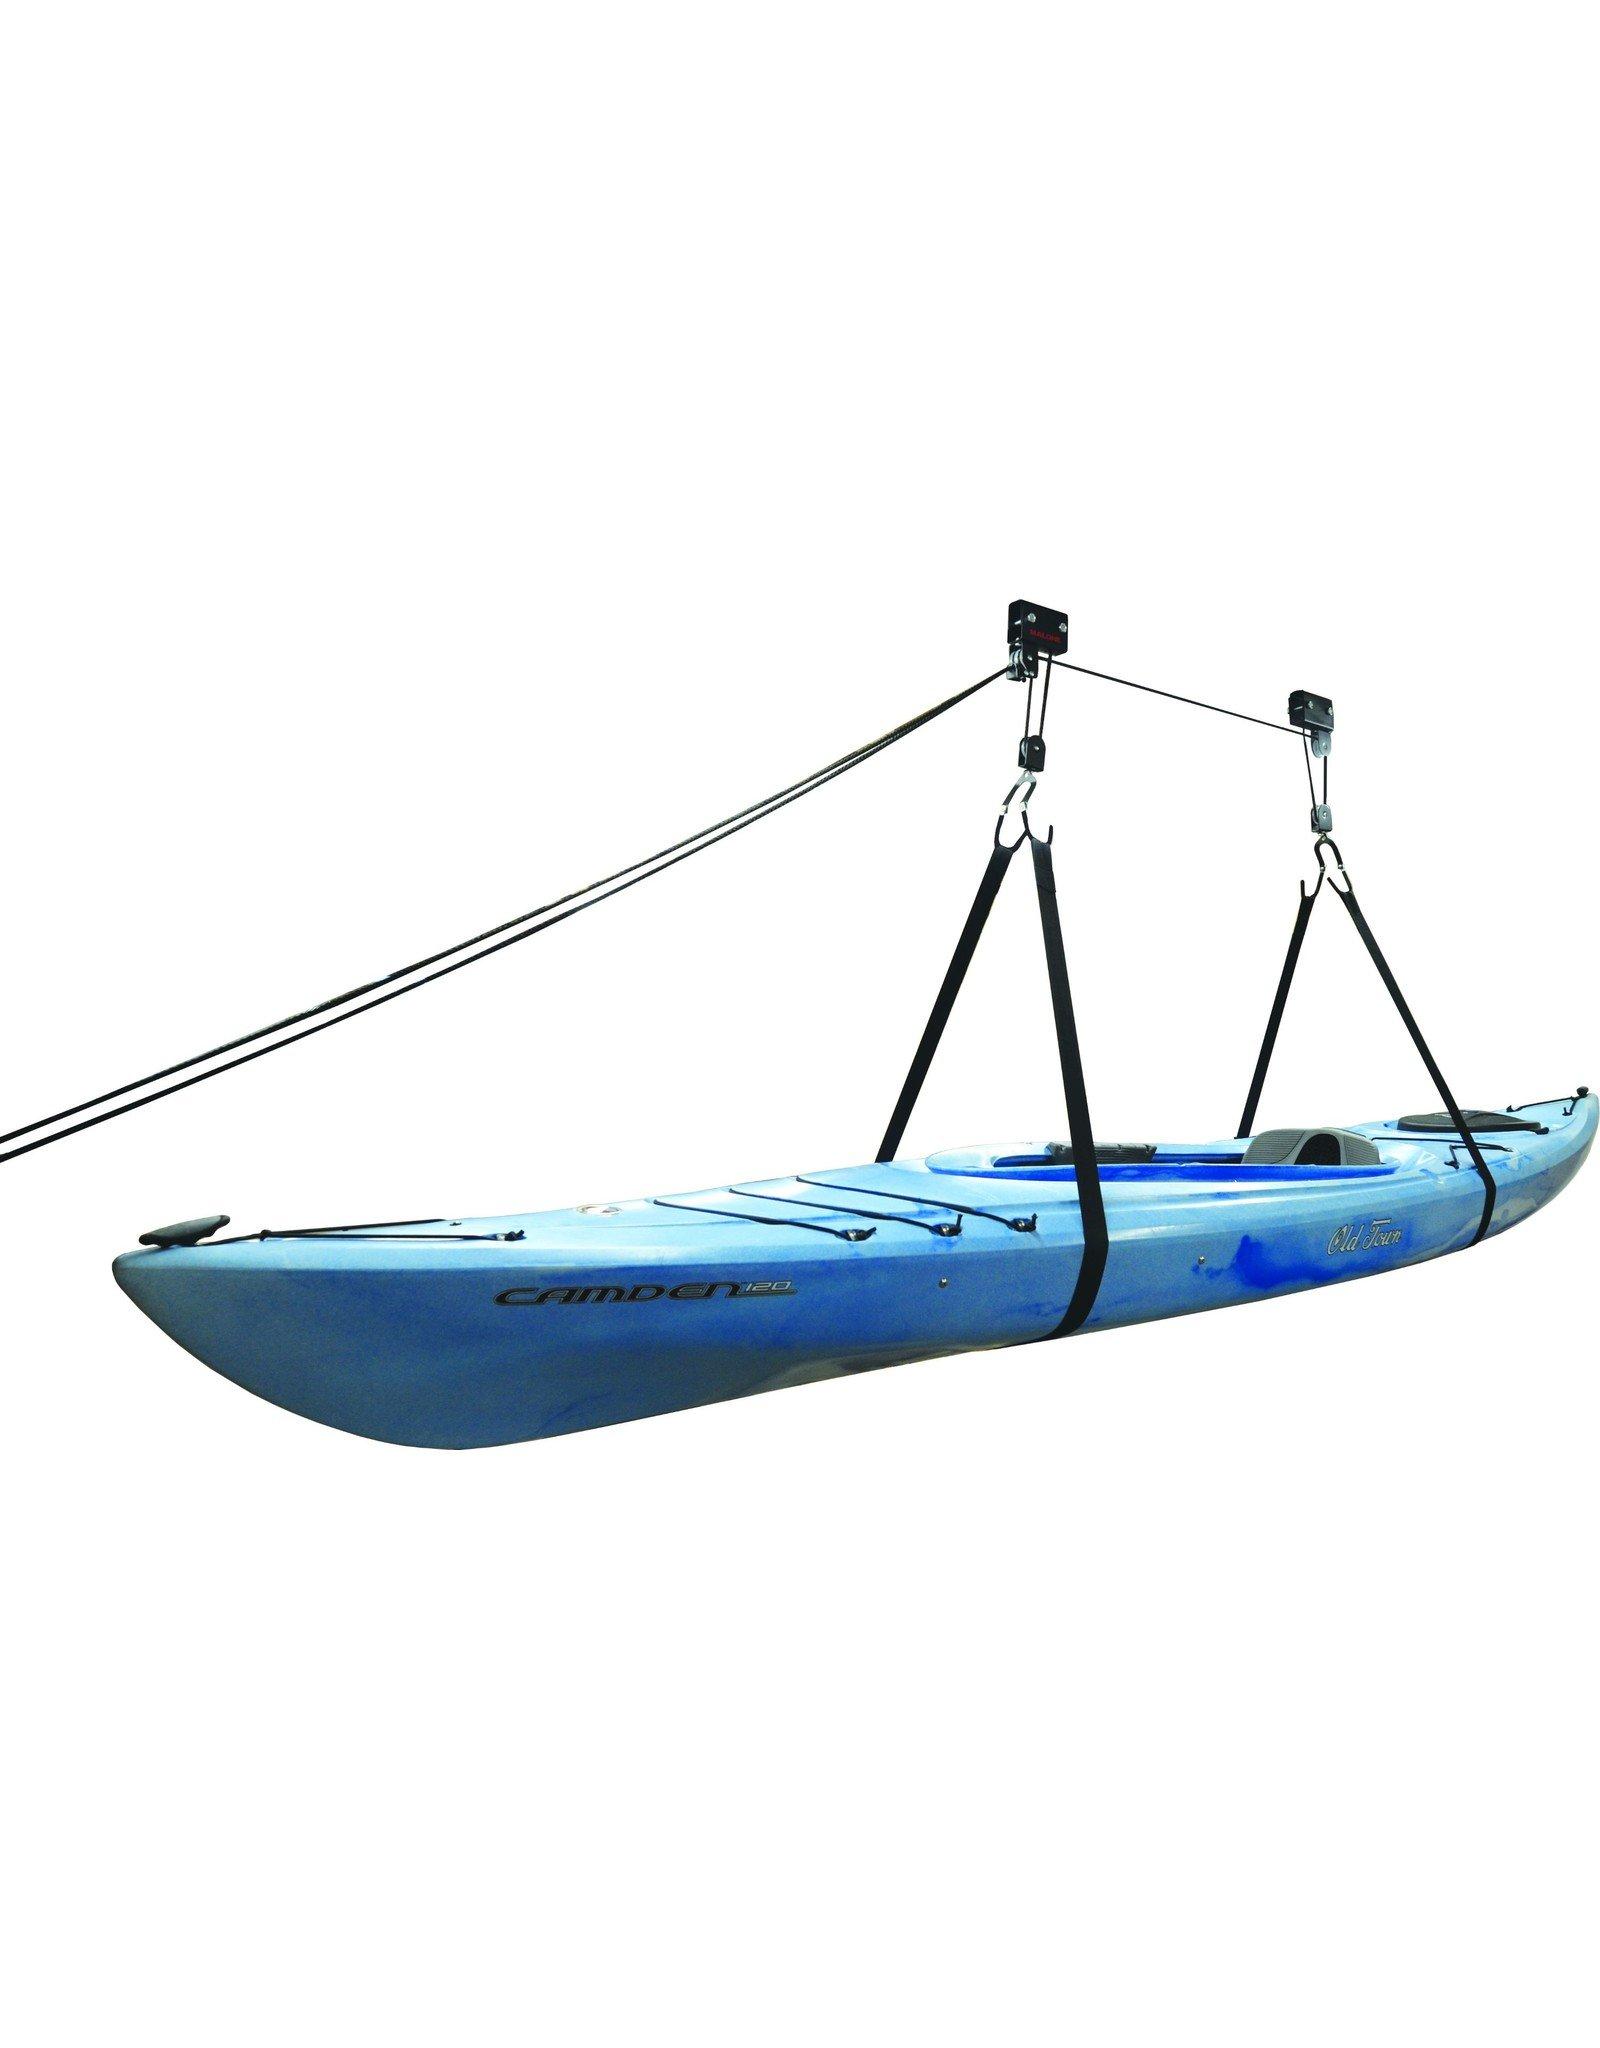 Malone Auto Rack Malone Kayak Hammock™ Deluxe hoist system